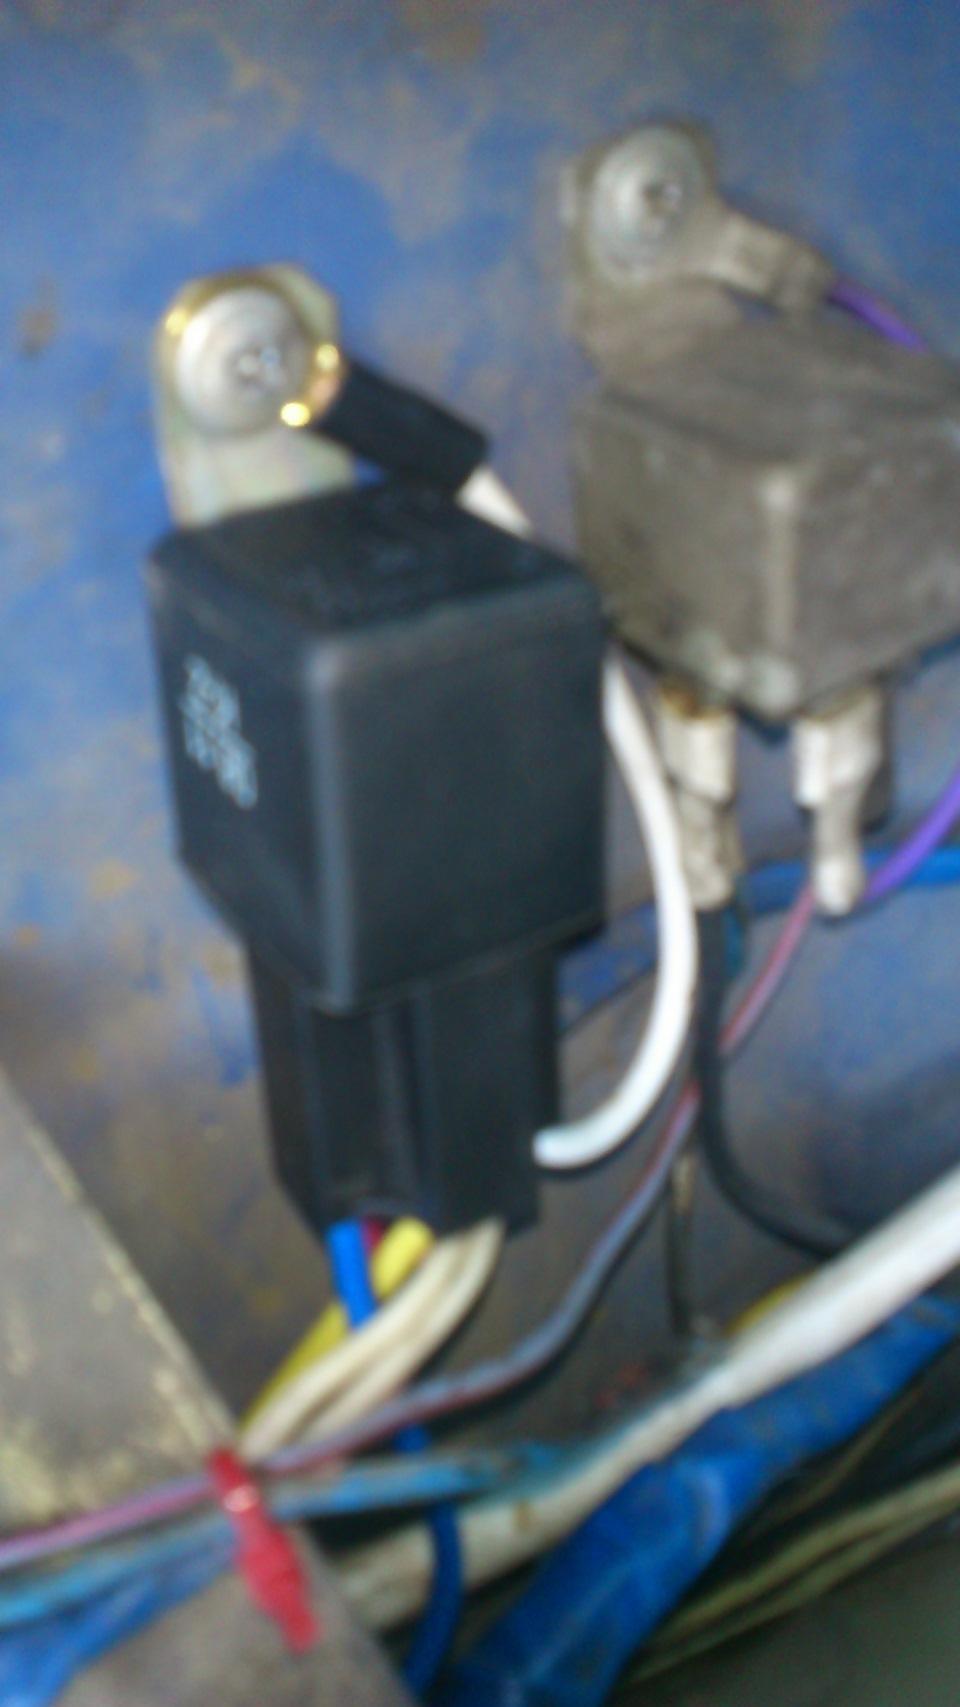 электрическаяэ схема лектробензонасос ваз 21043i